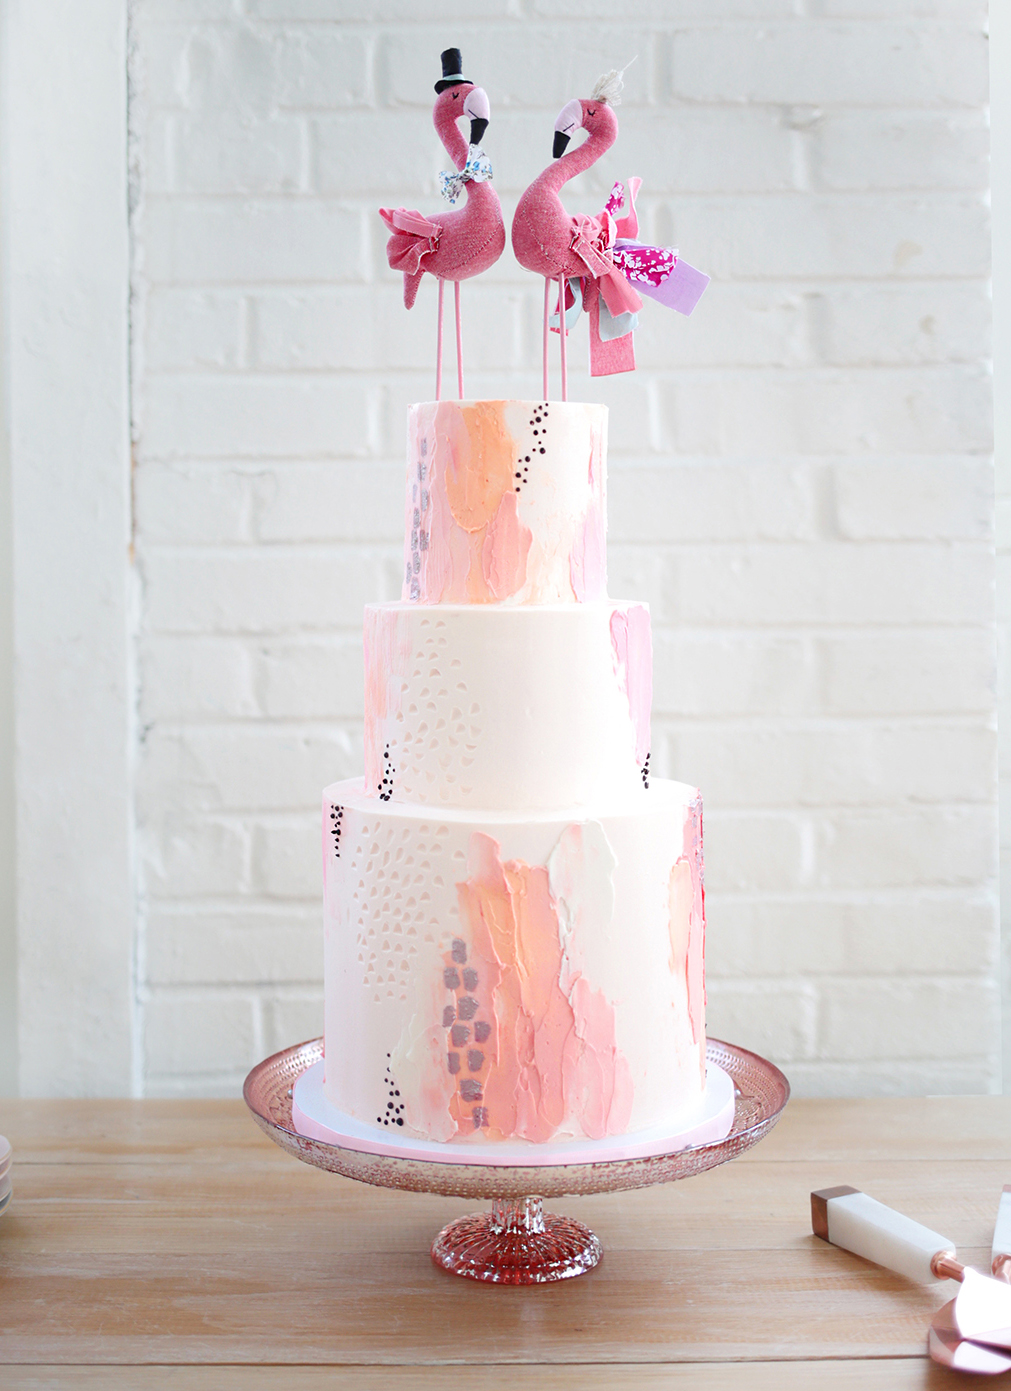 BHLDN-philadelphia-wedding-cake-by-whipped-bakeshop-cropped